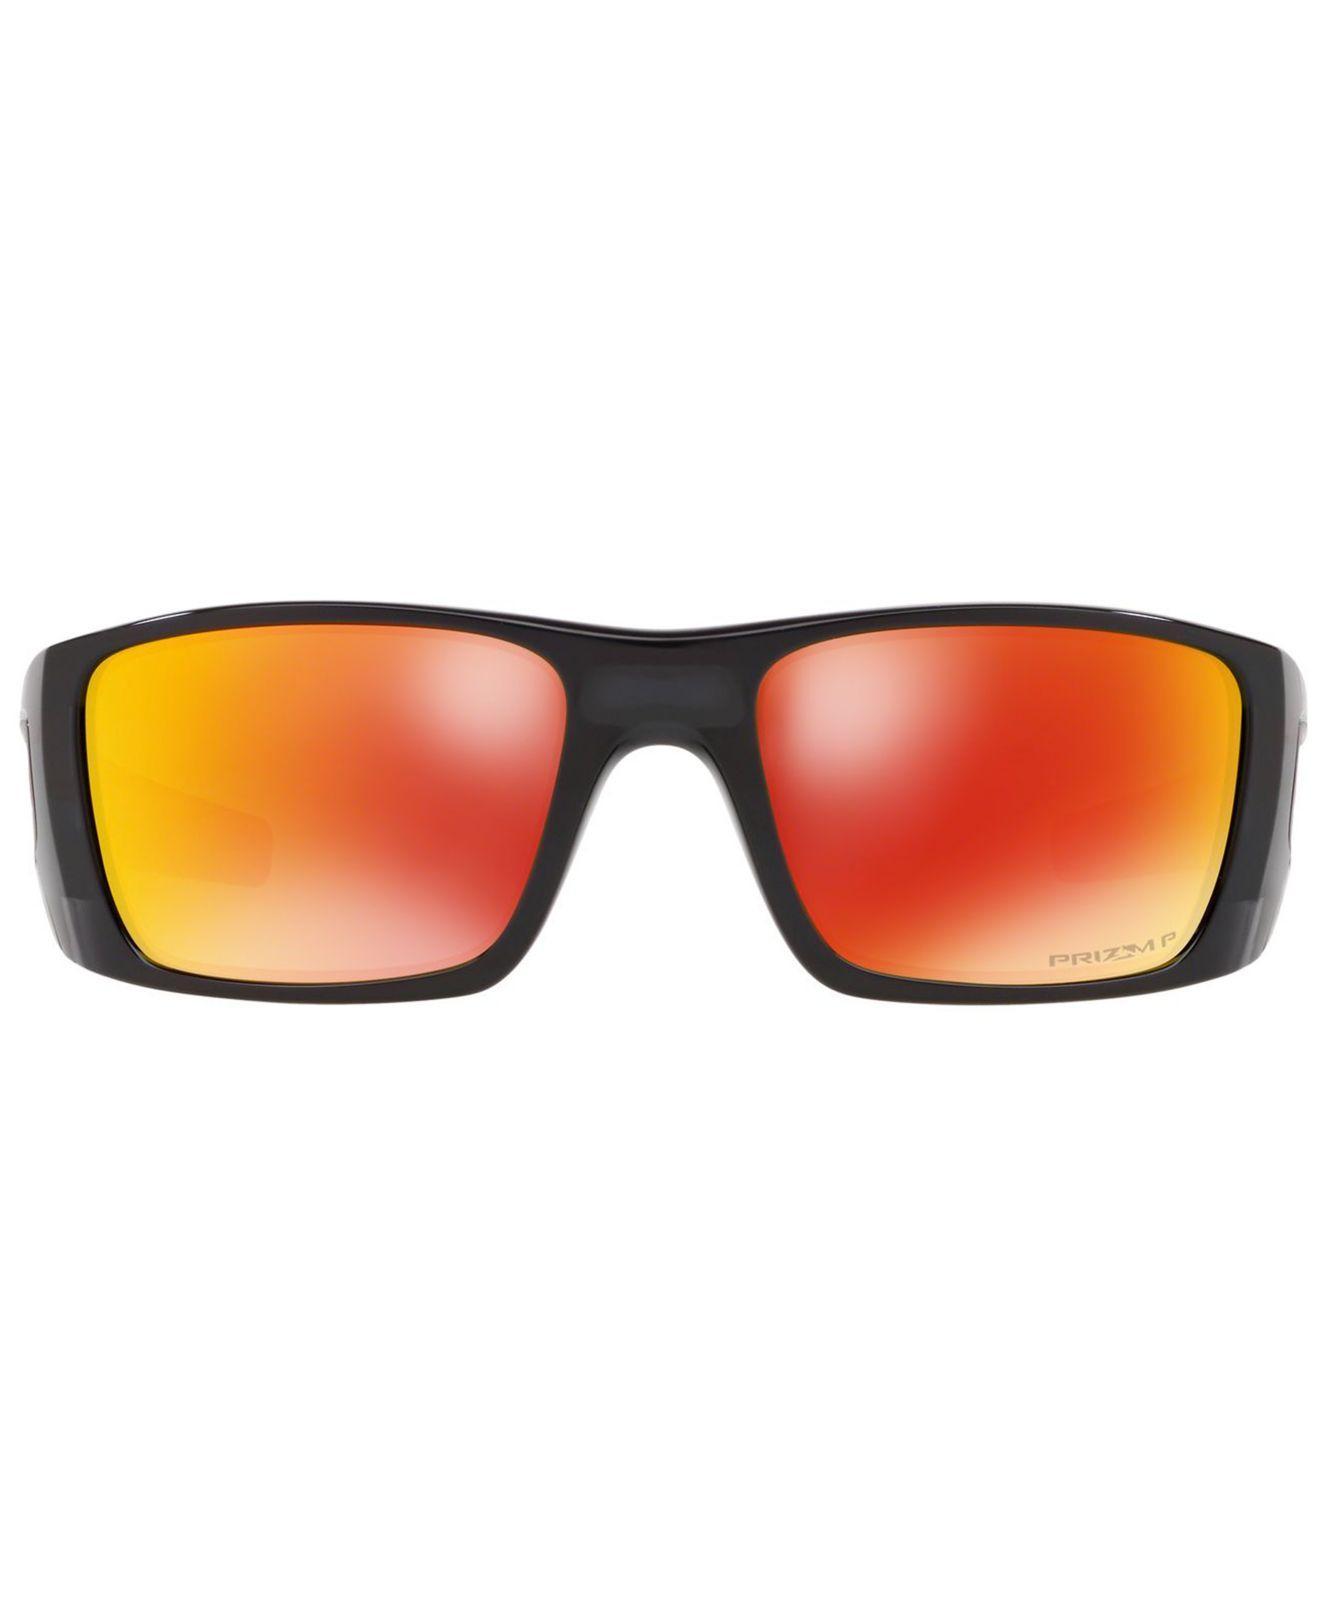 3aed9c9ab8 Lyst - Oakley Polarized Sunglasses